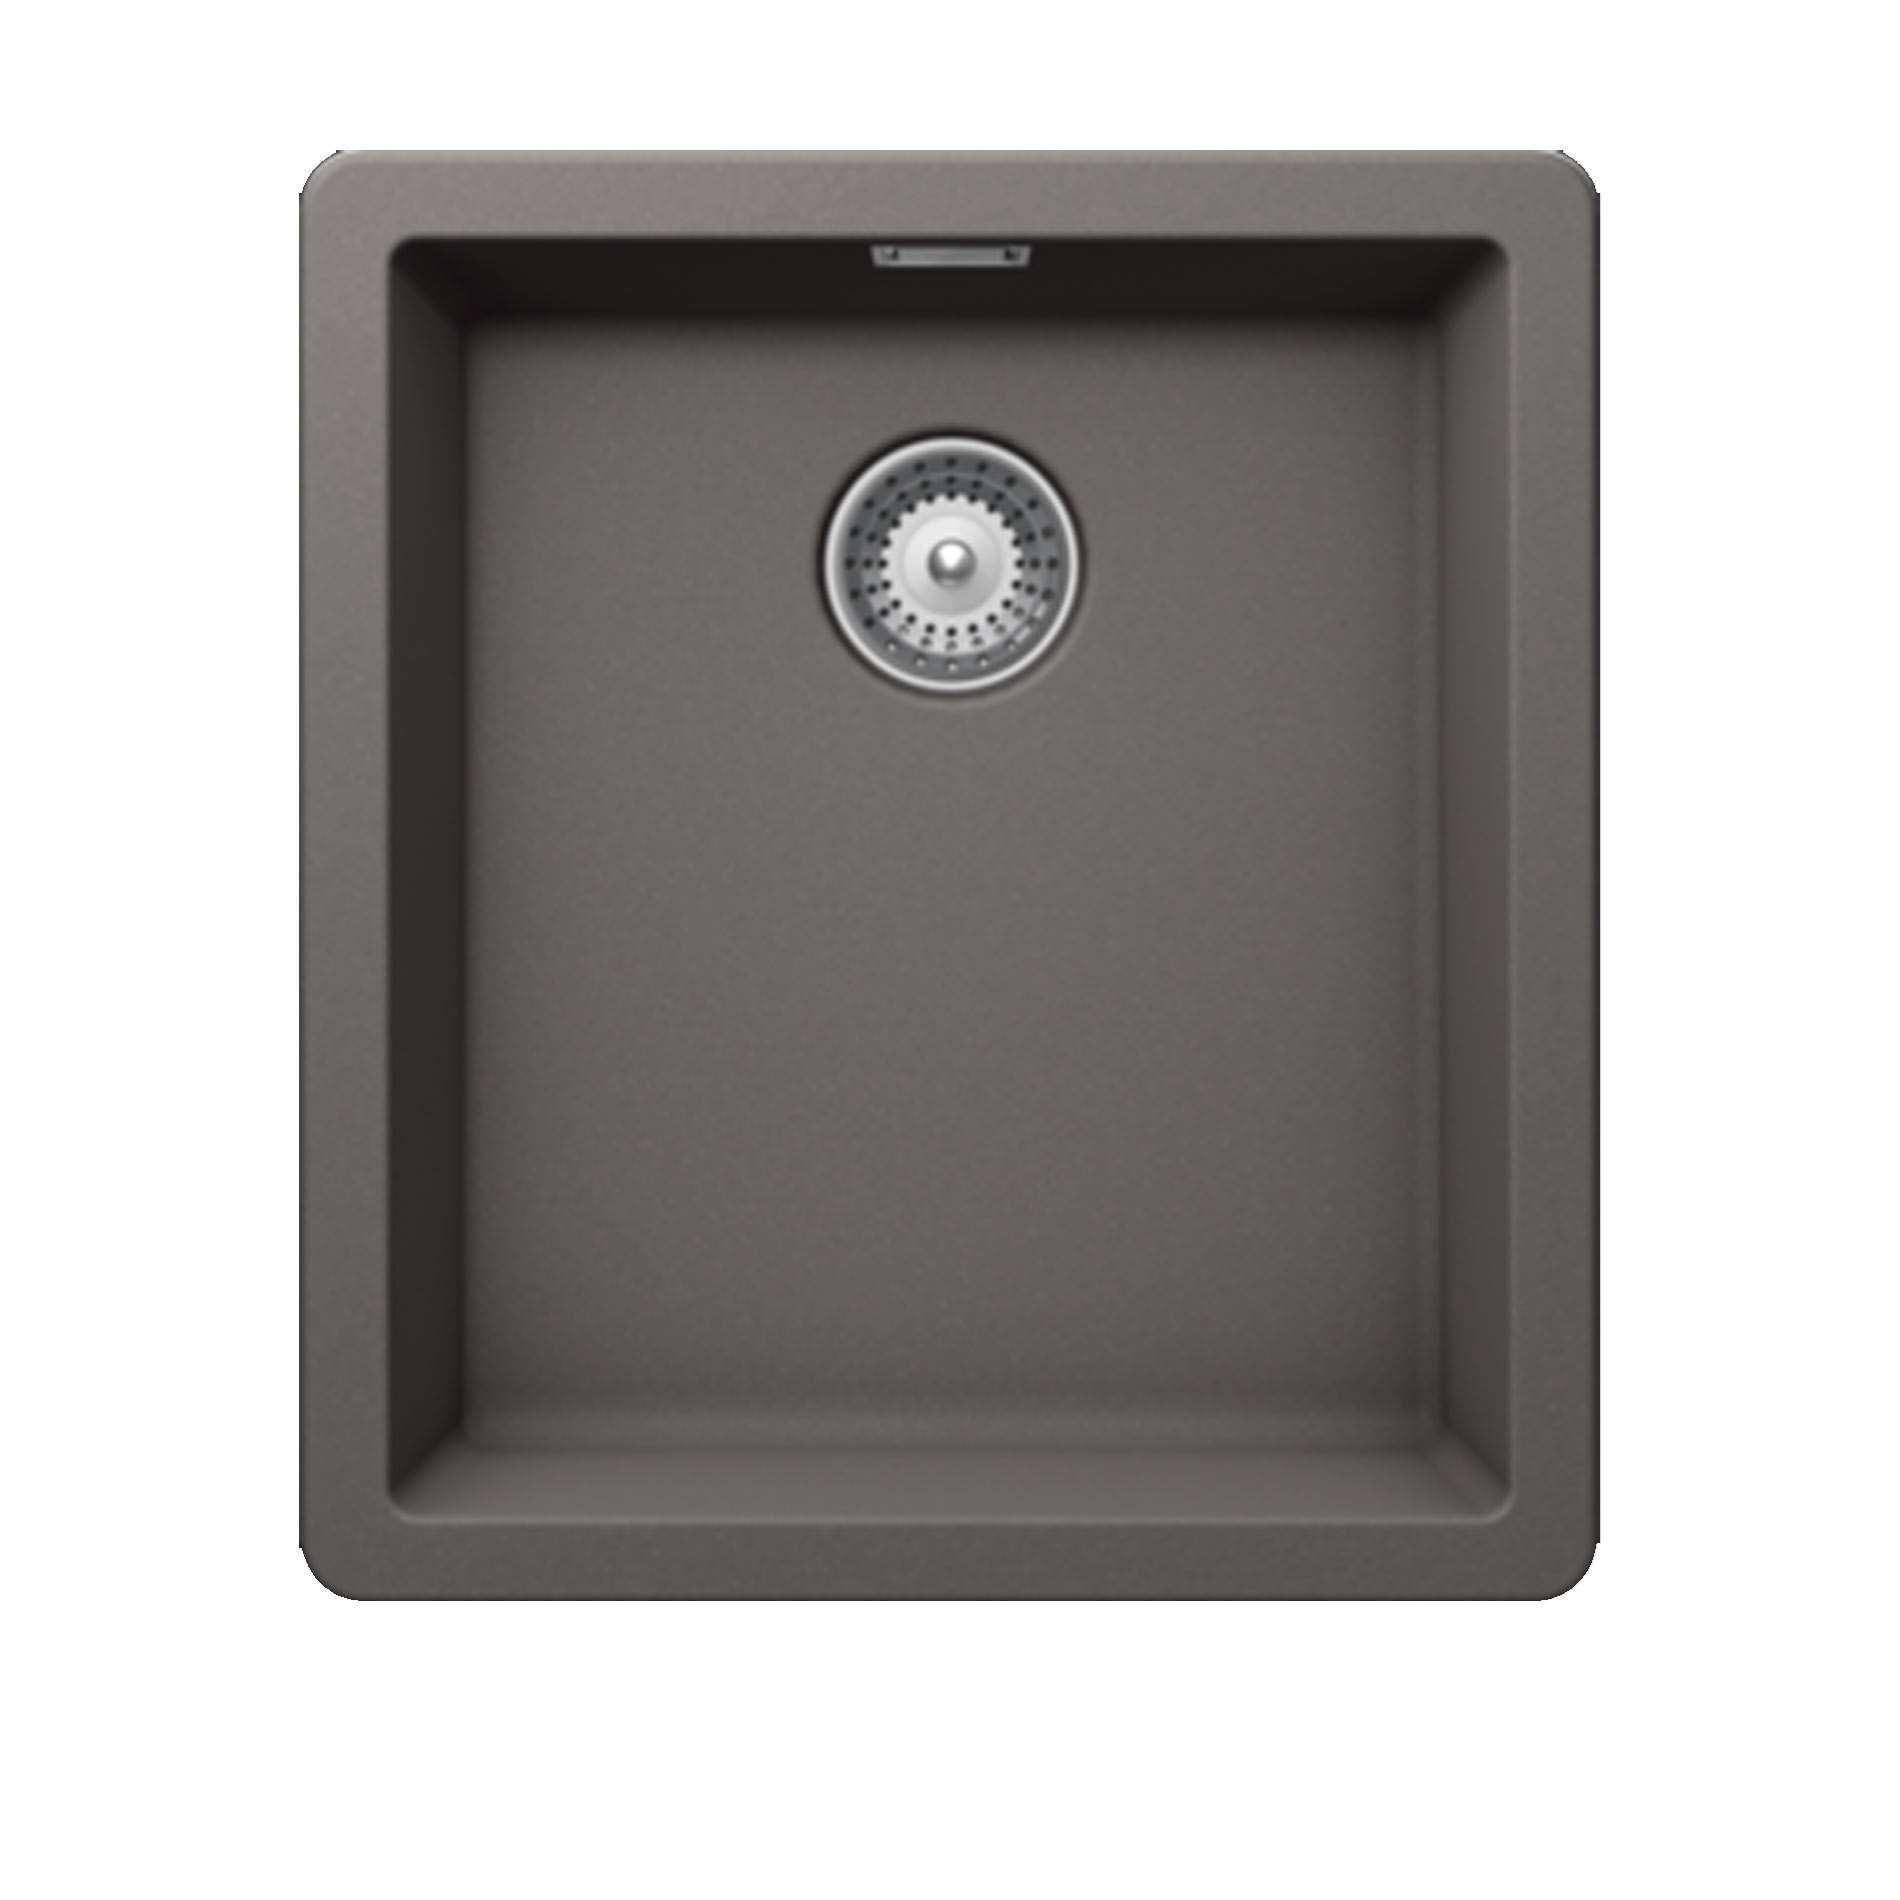 Picture of Greenwich N 100 S Silverstone Granite Sink